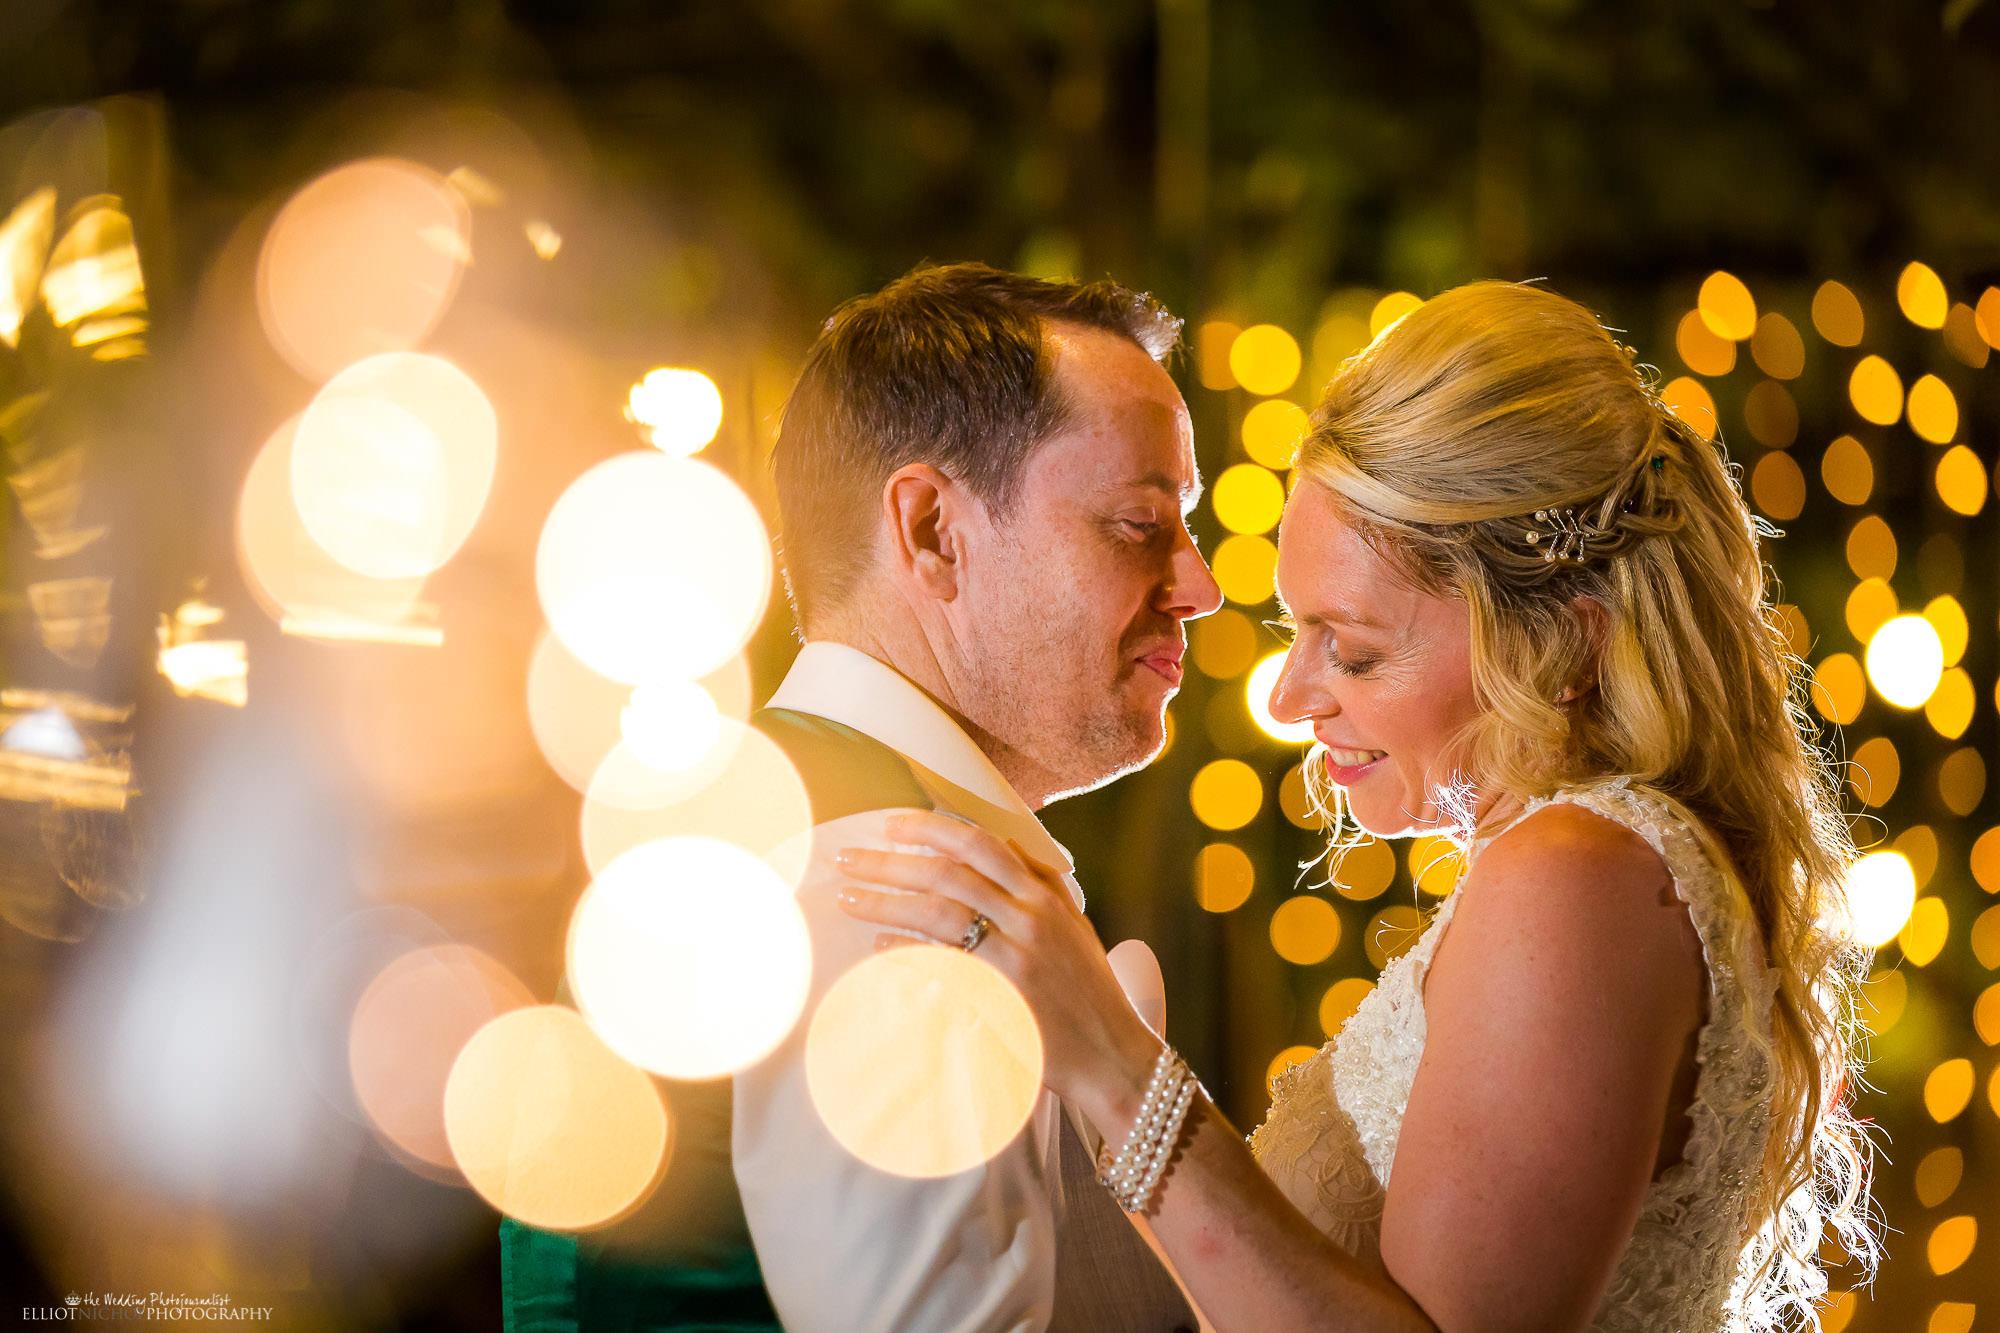 newlyweds-first-dance-wedding-reception-destination-photographer